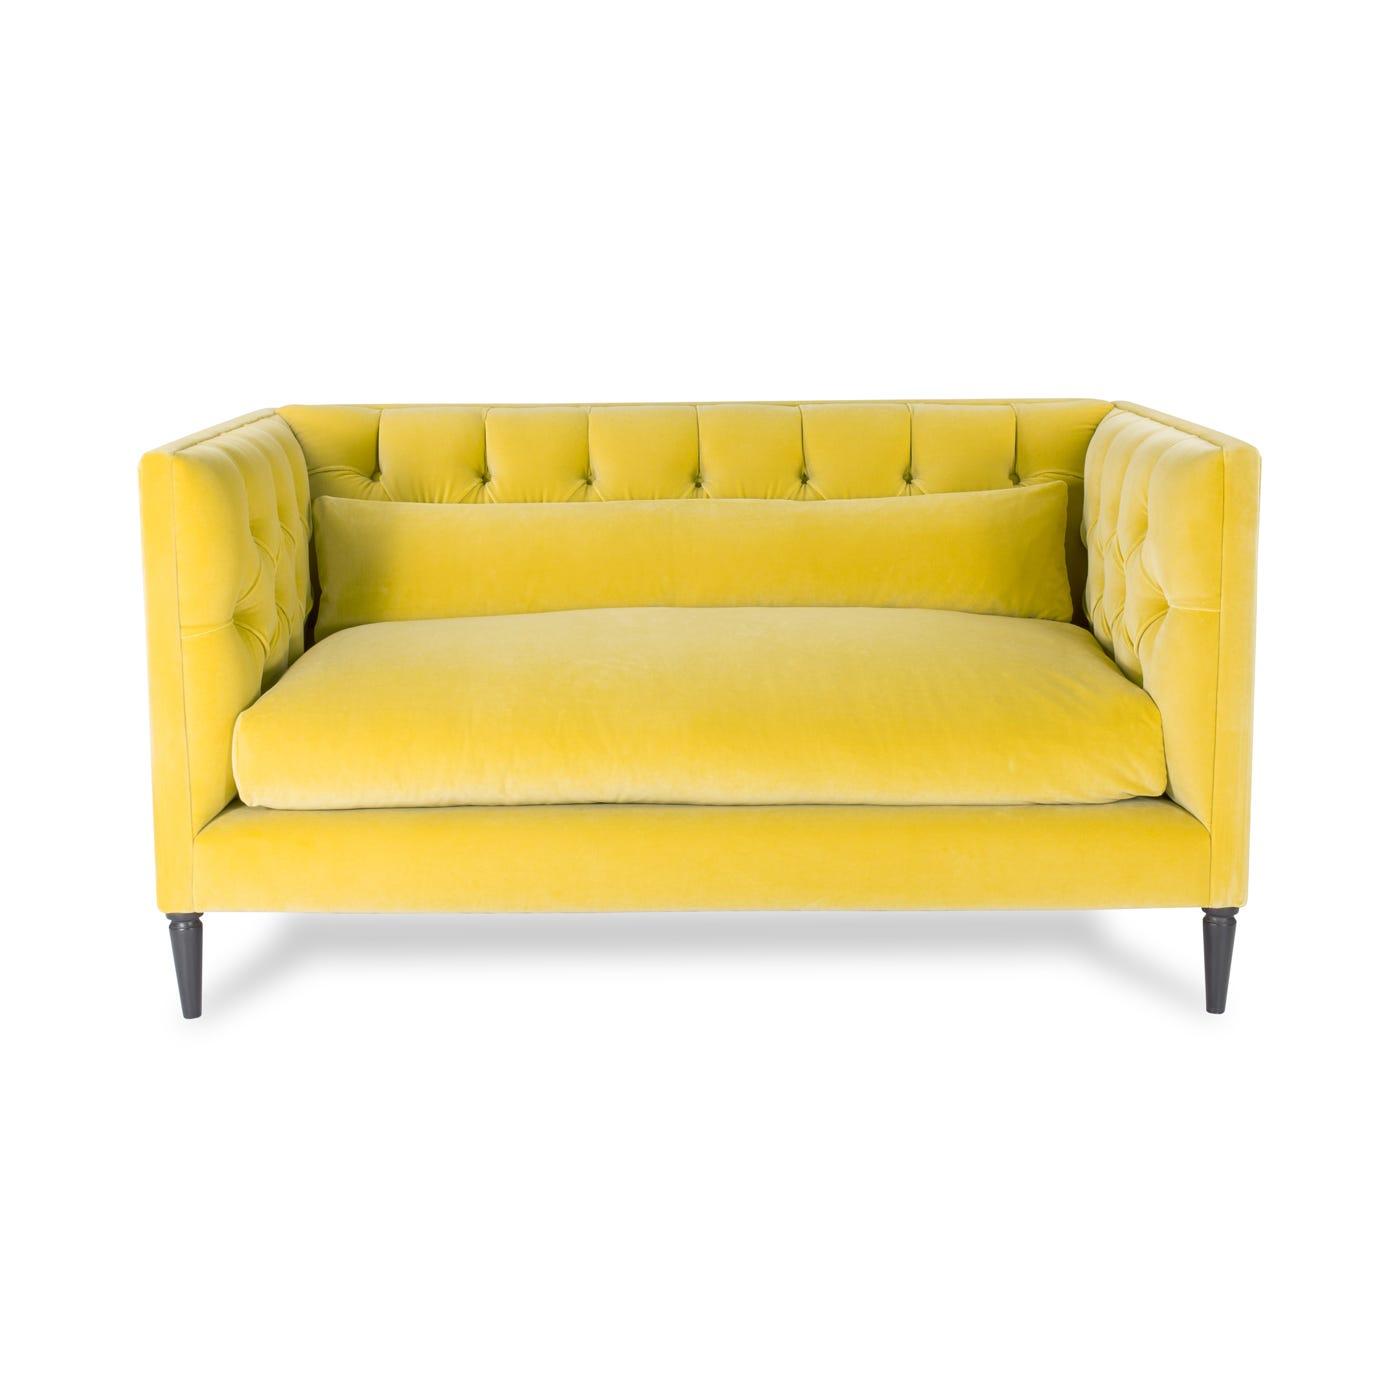 Balmoral 2 Seater Sofa